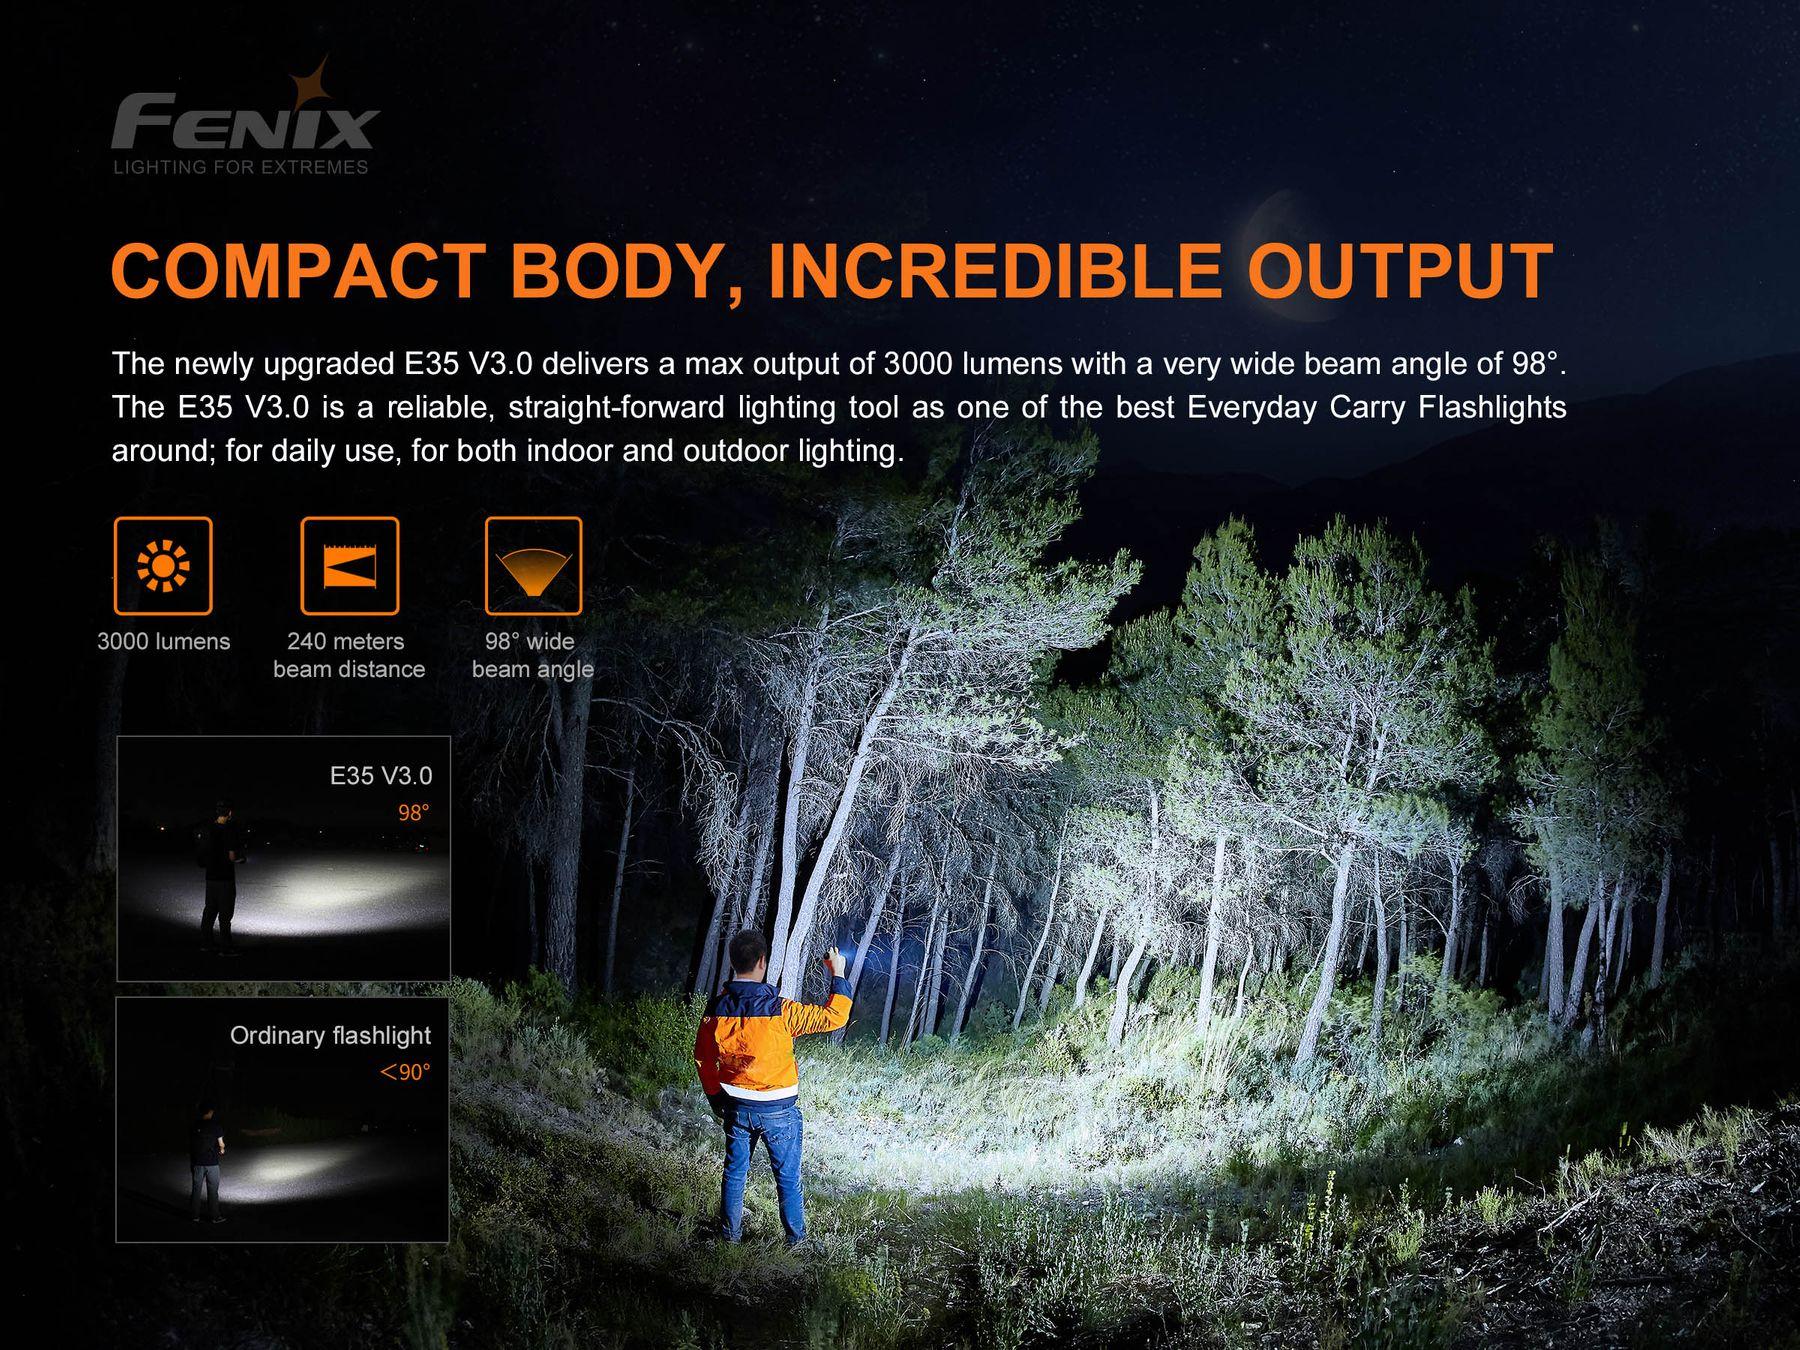 fenix e35 v3 3000 lumen led outdoor 21700 akku taschenlampe